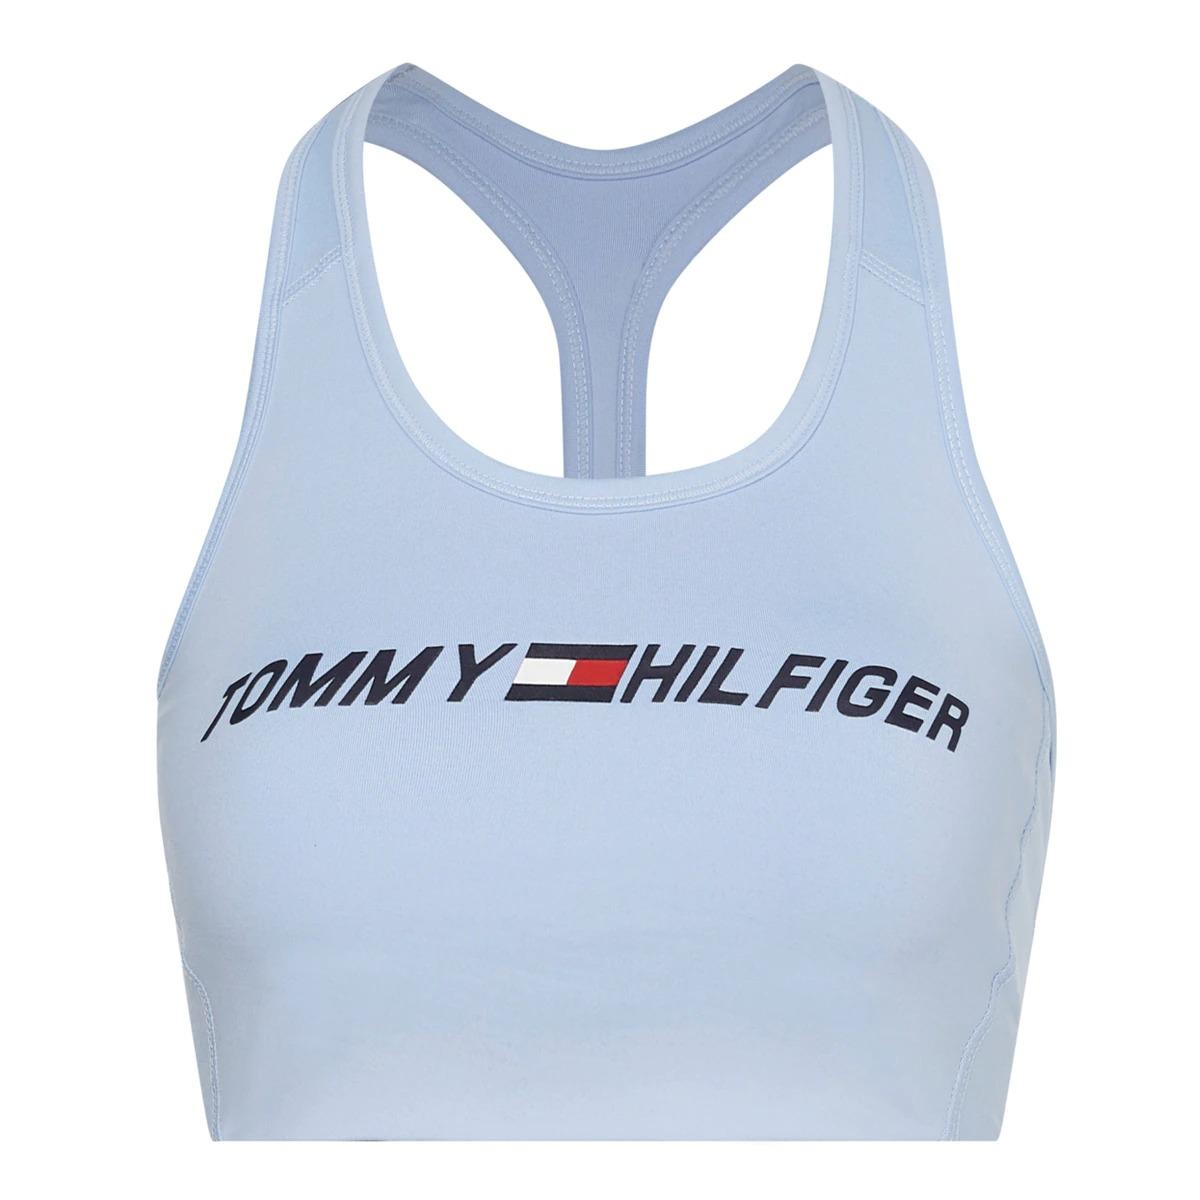 Sujetador deportivo de mujer Light Intensity Grap Tommy Hilfiger Sport